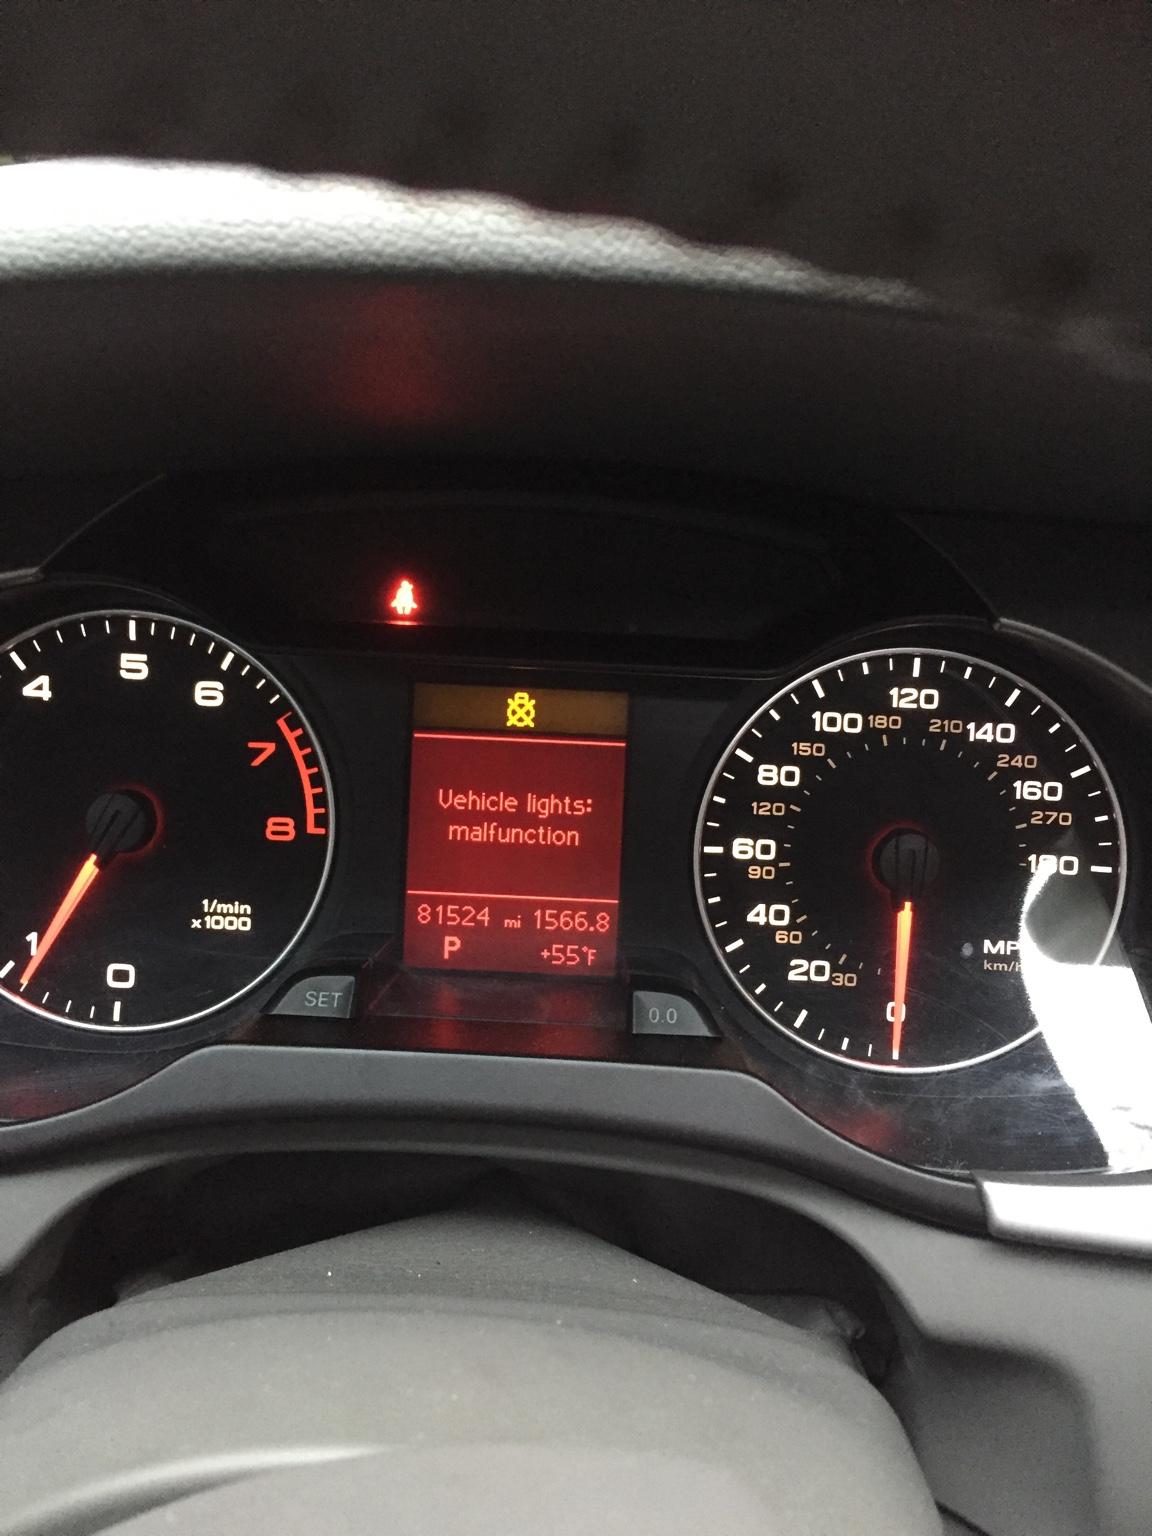 vehicle lights malfunction audi a4 | Adiklight co